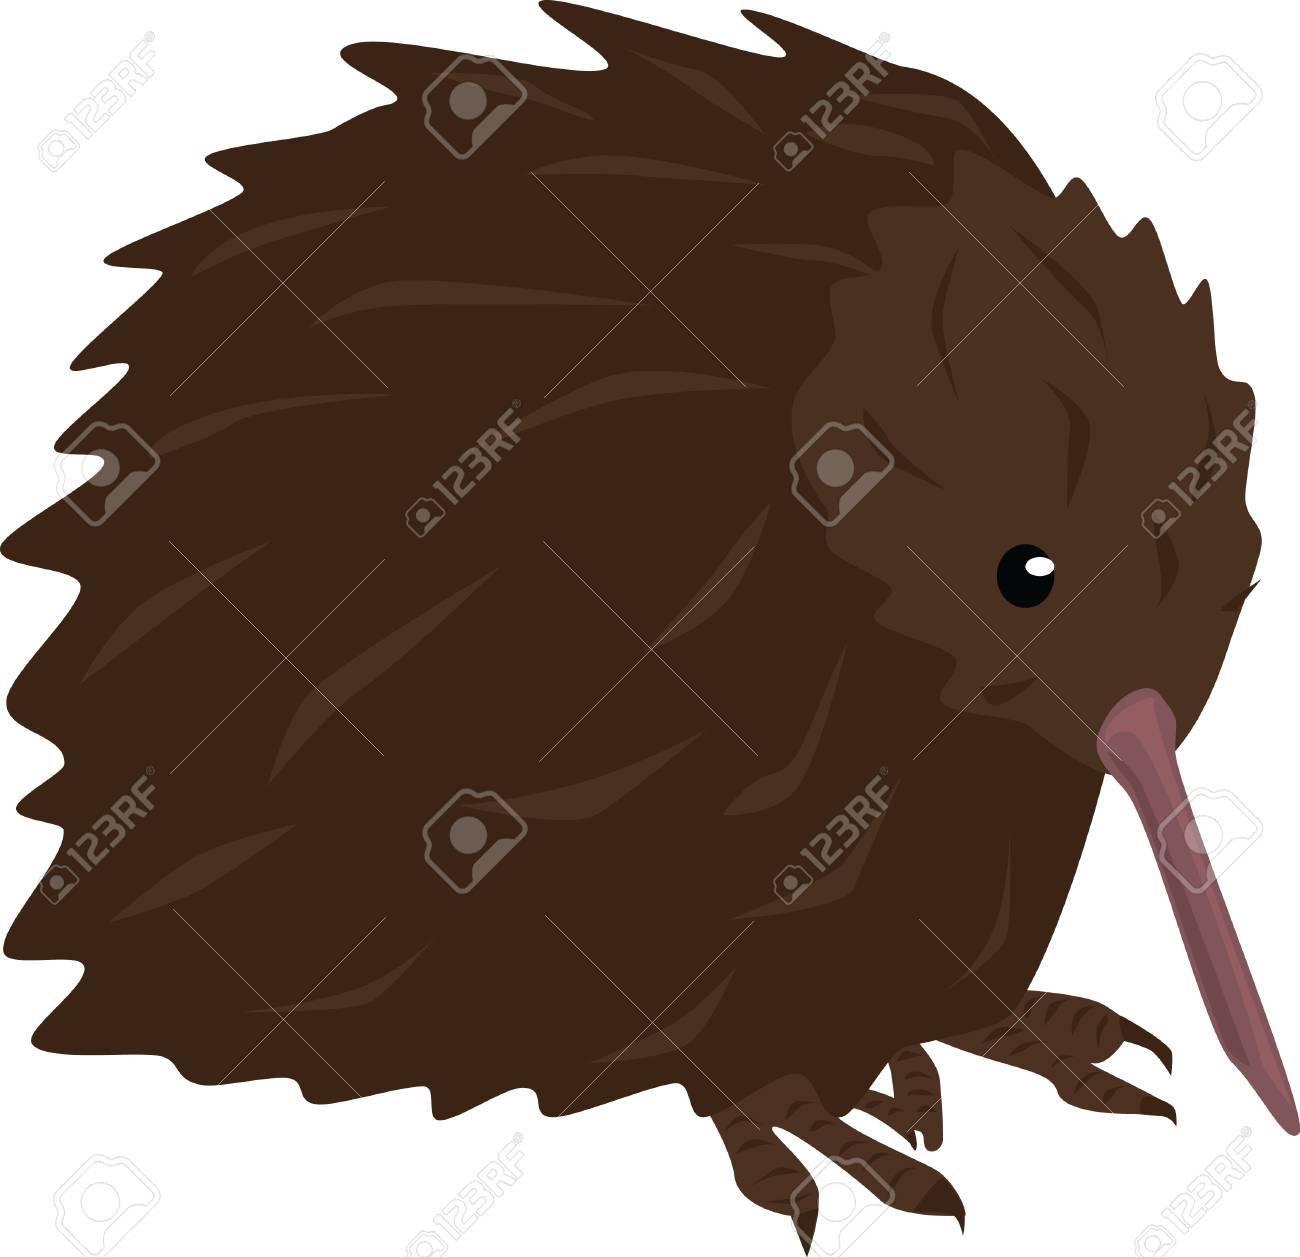 A Kiwi bird is native to New Zealand. Stock Vector - 15419683